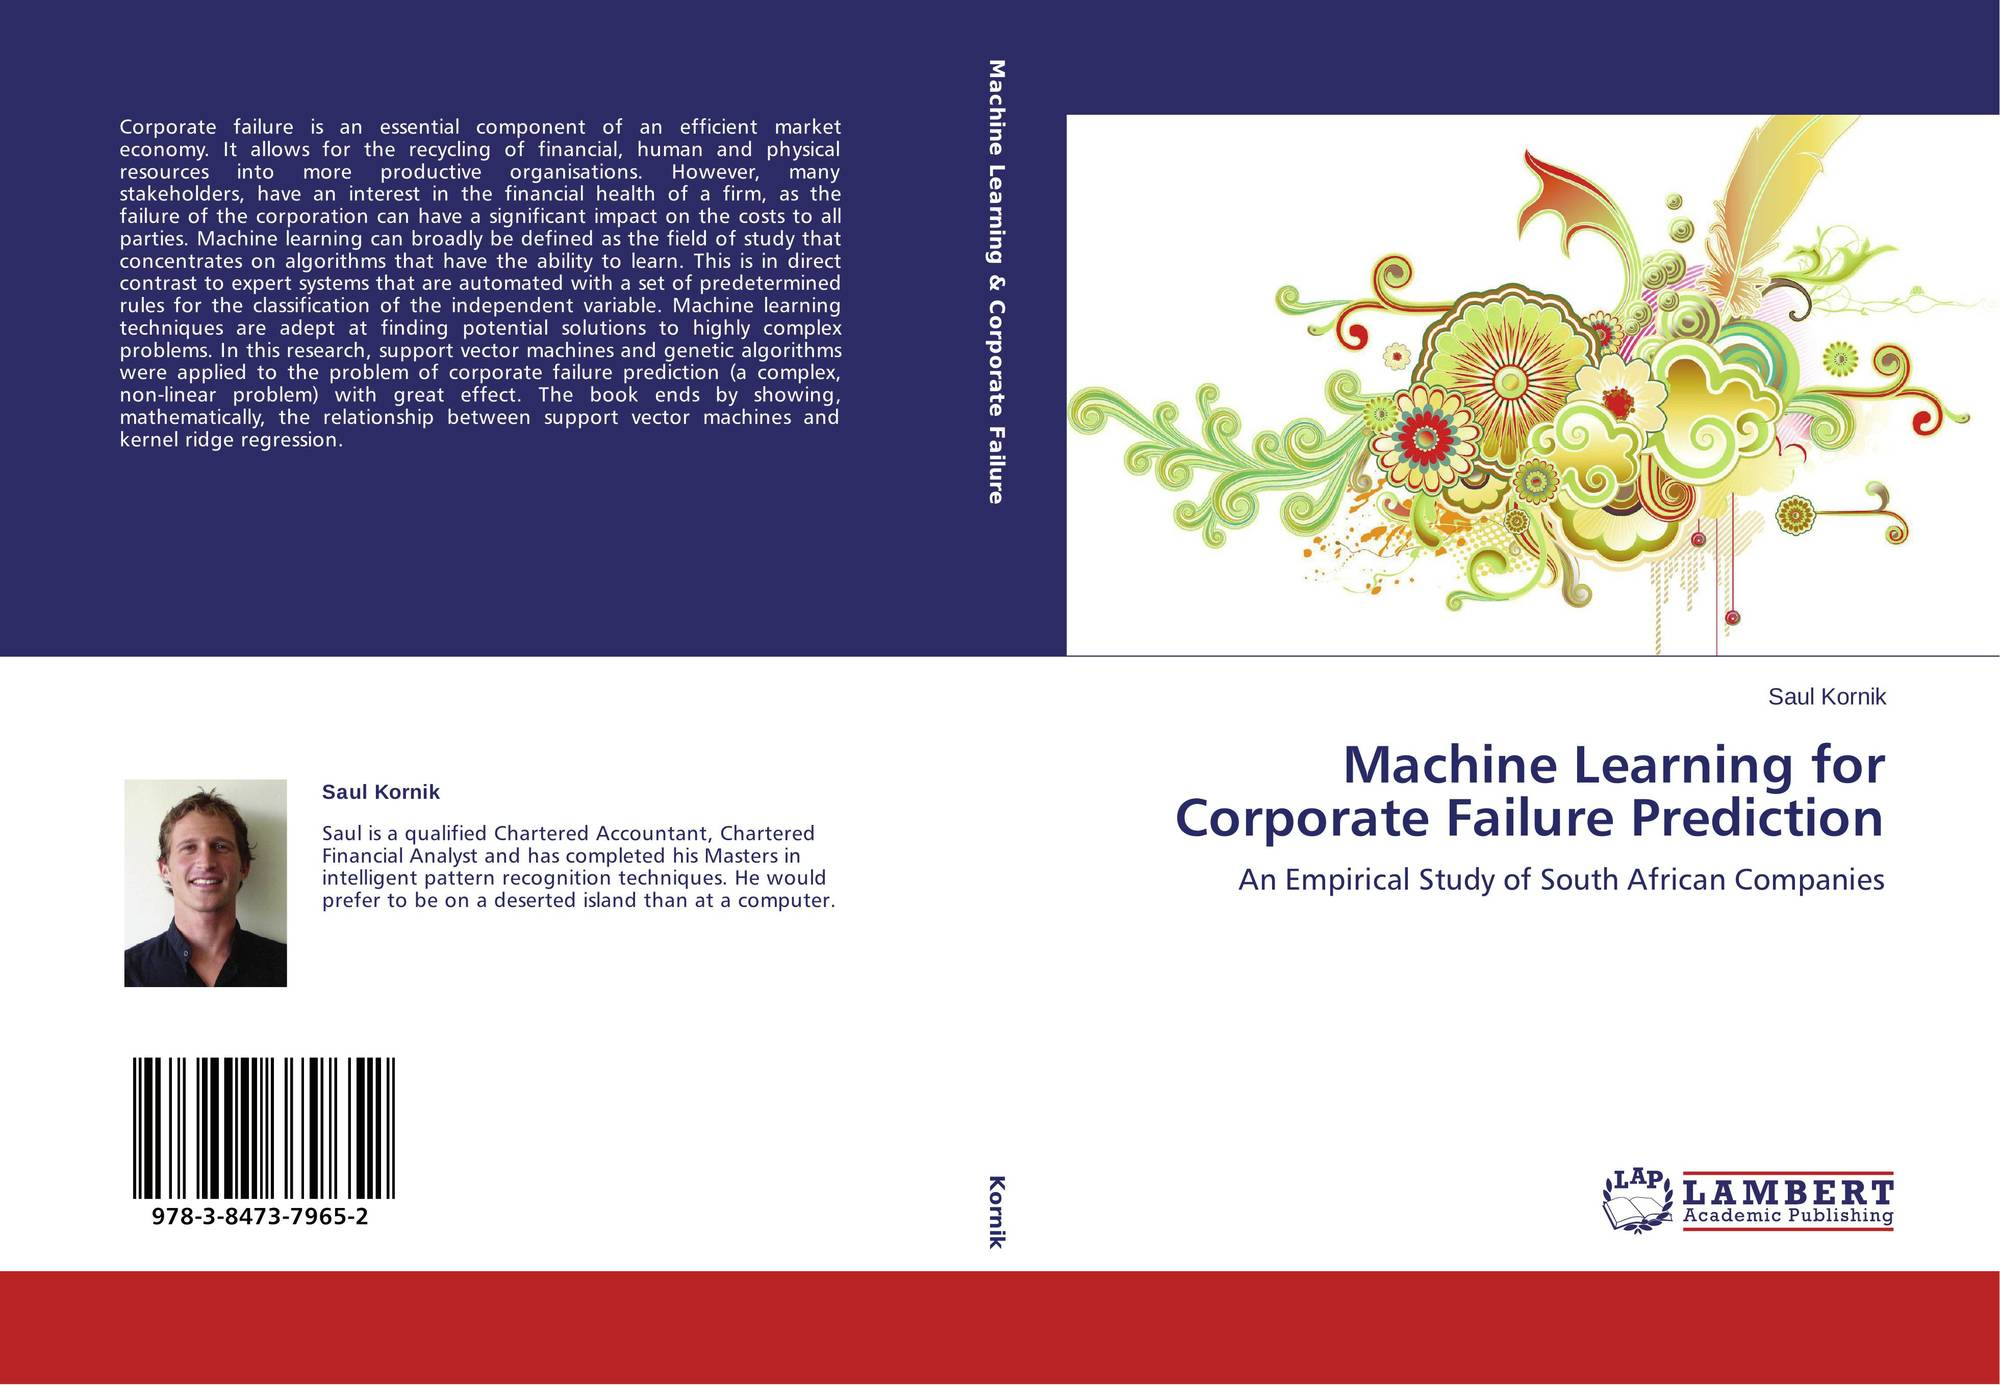 Machine Learning for Corporate Failure Prediction, 978-3